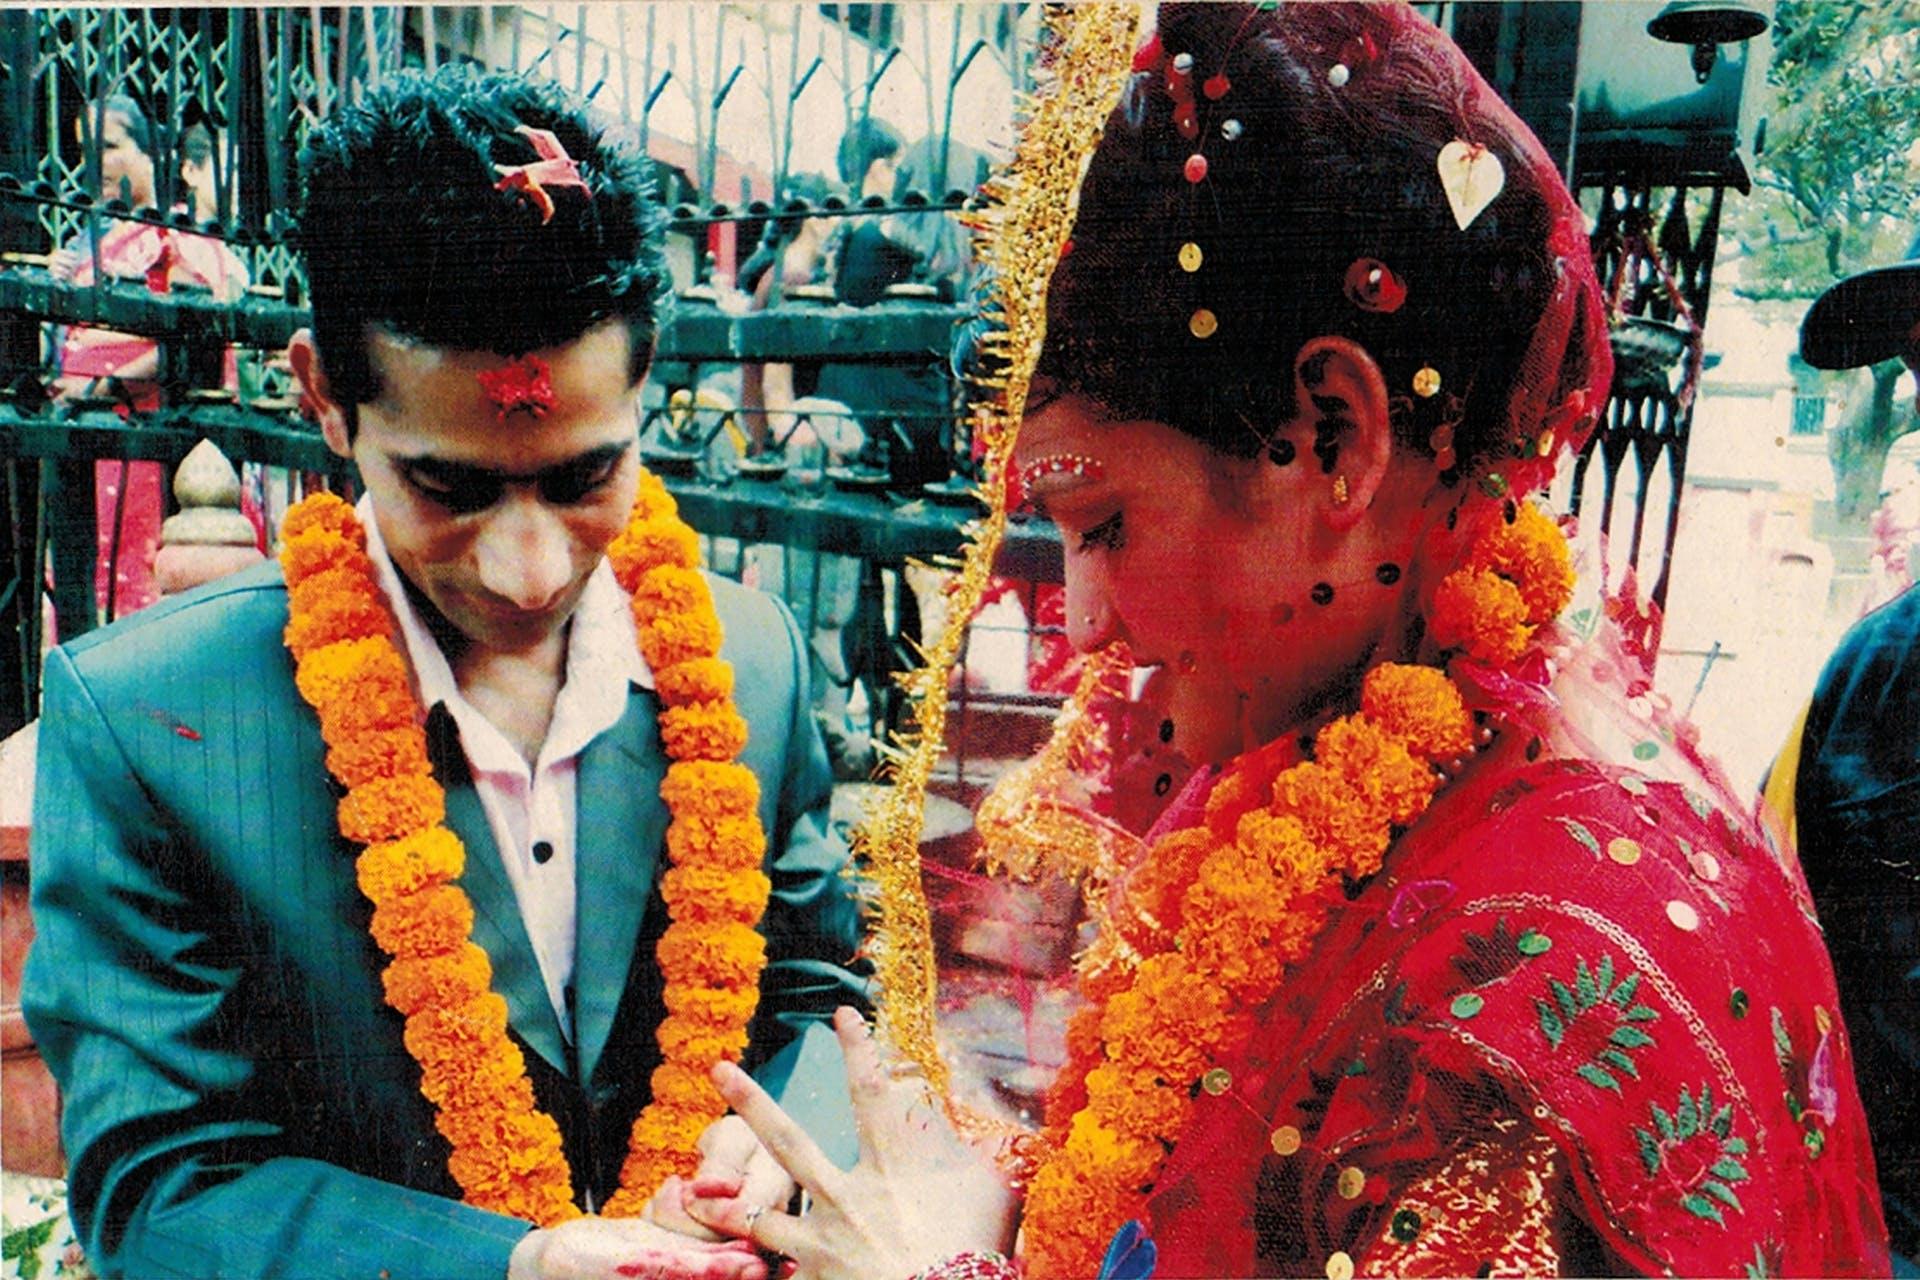 prem sharma paudel prem sharma paudel wedding couples wedding lovely couple